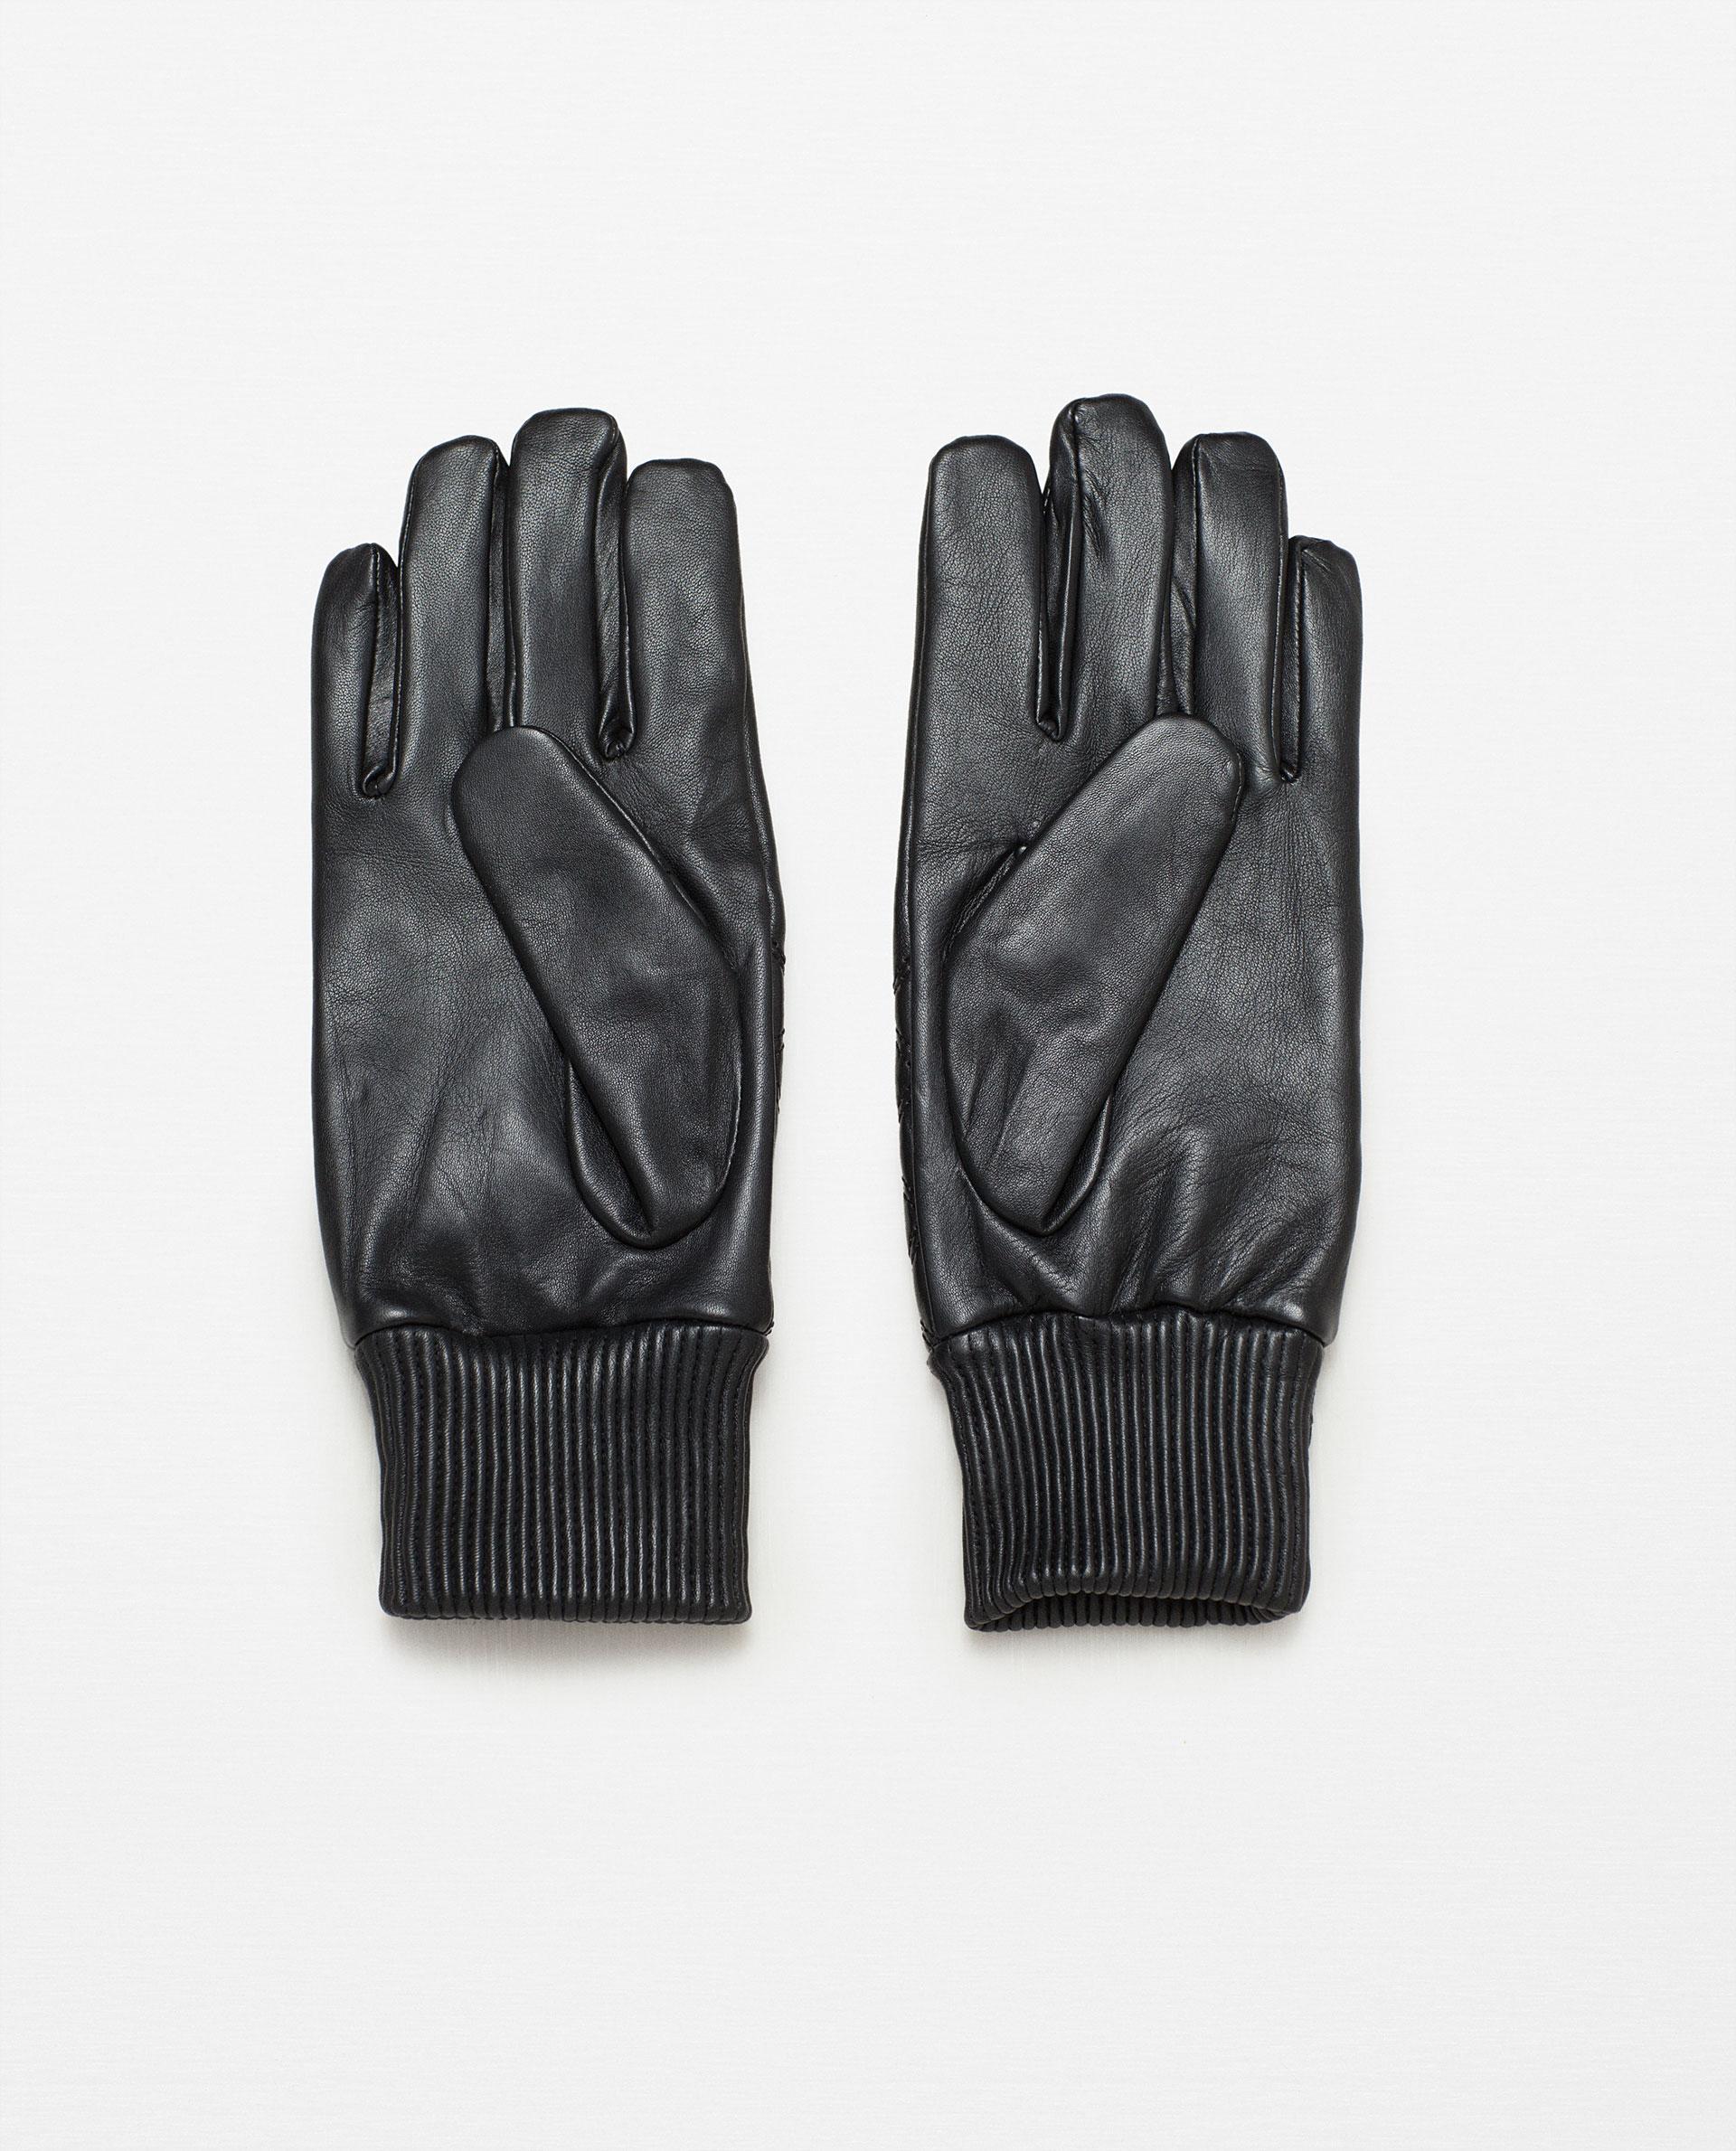 ZARA MAN Men's 11 / 44 Black Glove Leather Double Monk Strap Fashion Sneakers Black Glove Leather Double Monk Strap Fashion Sneakers. The black leather uppers are .